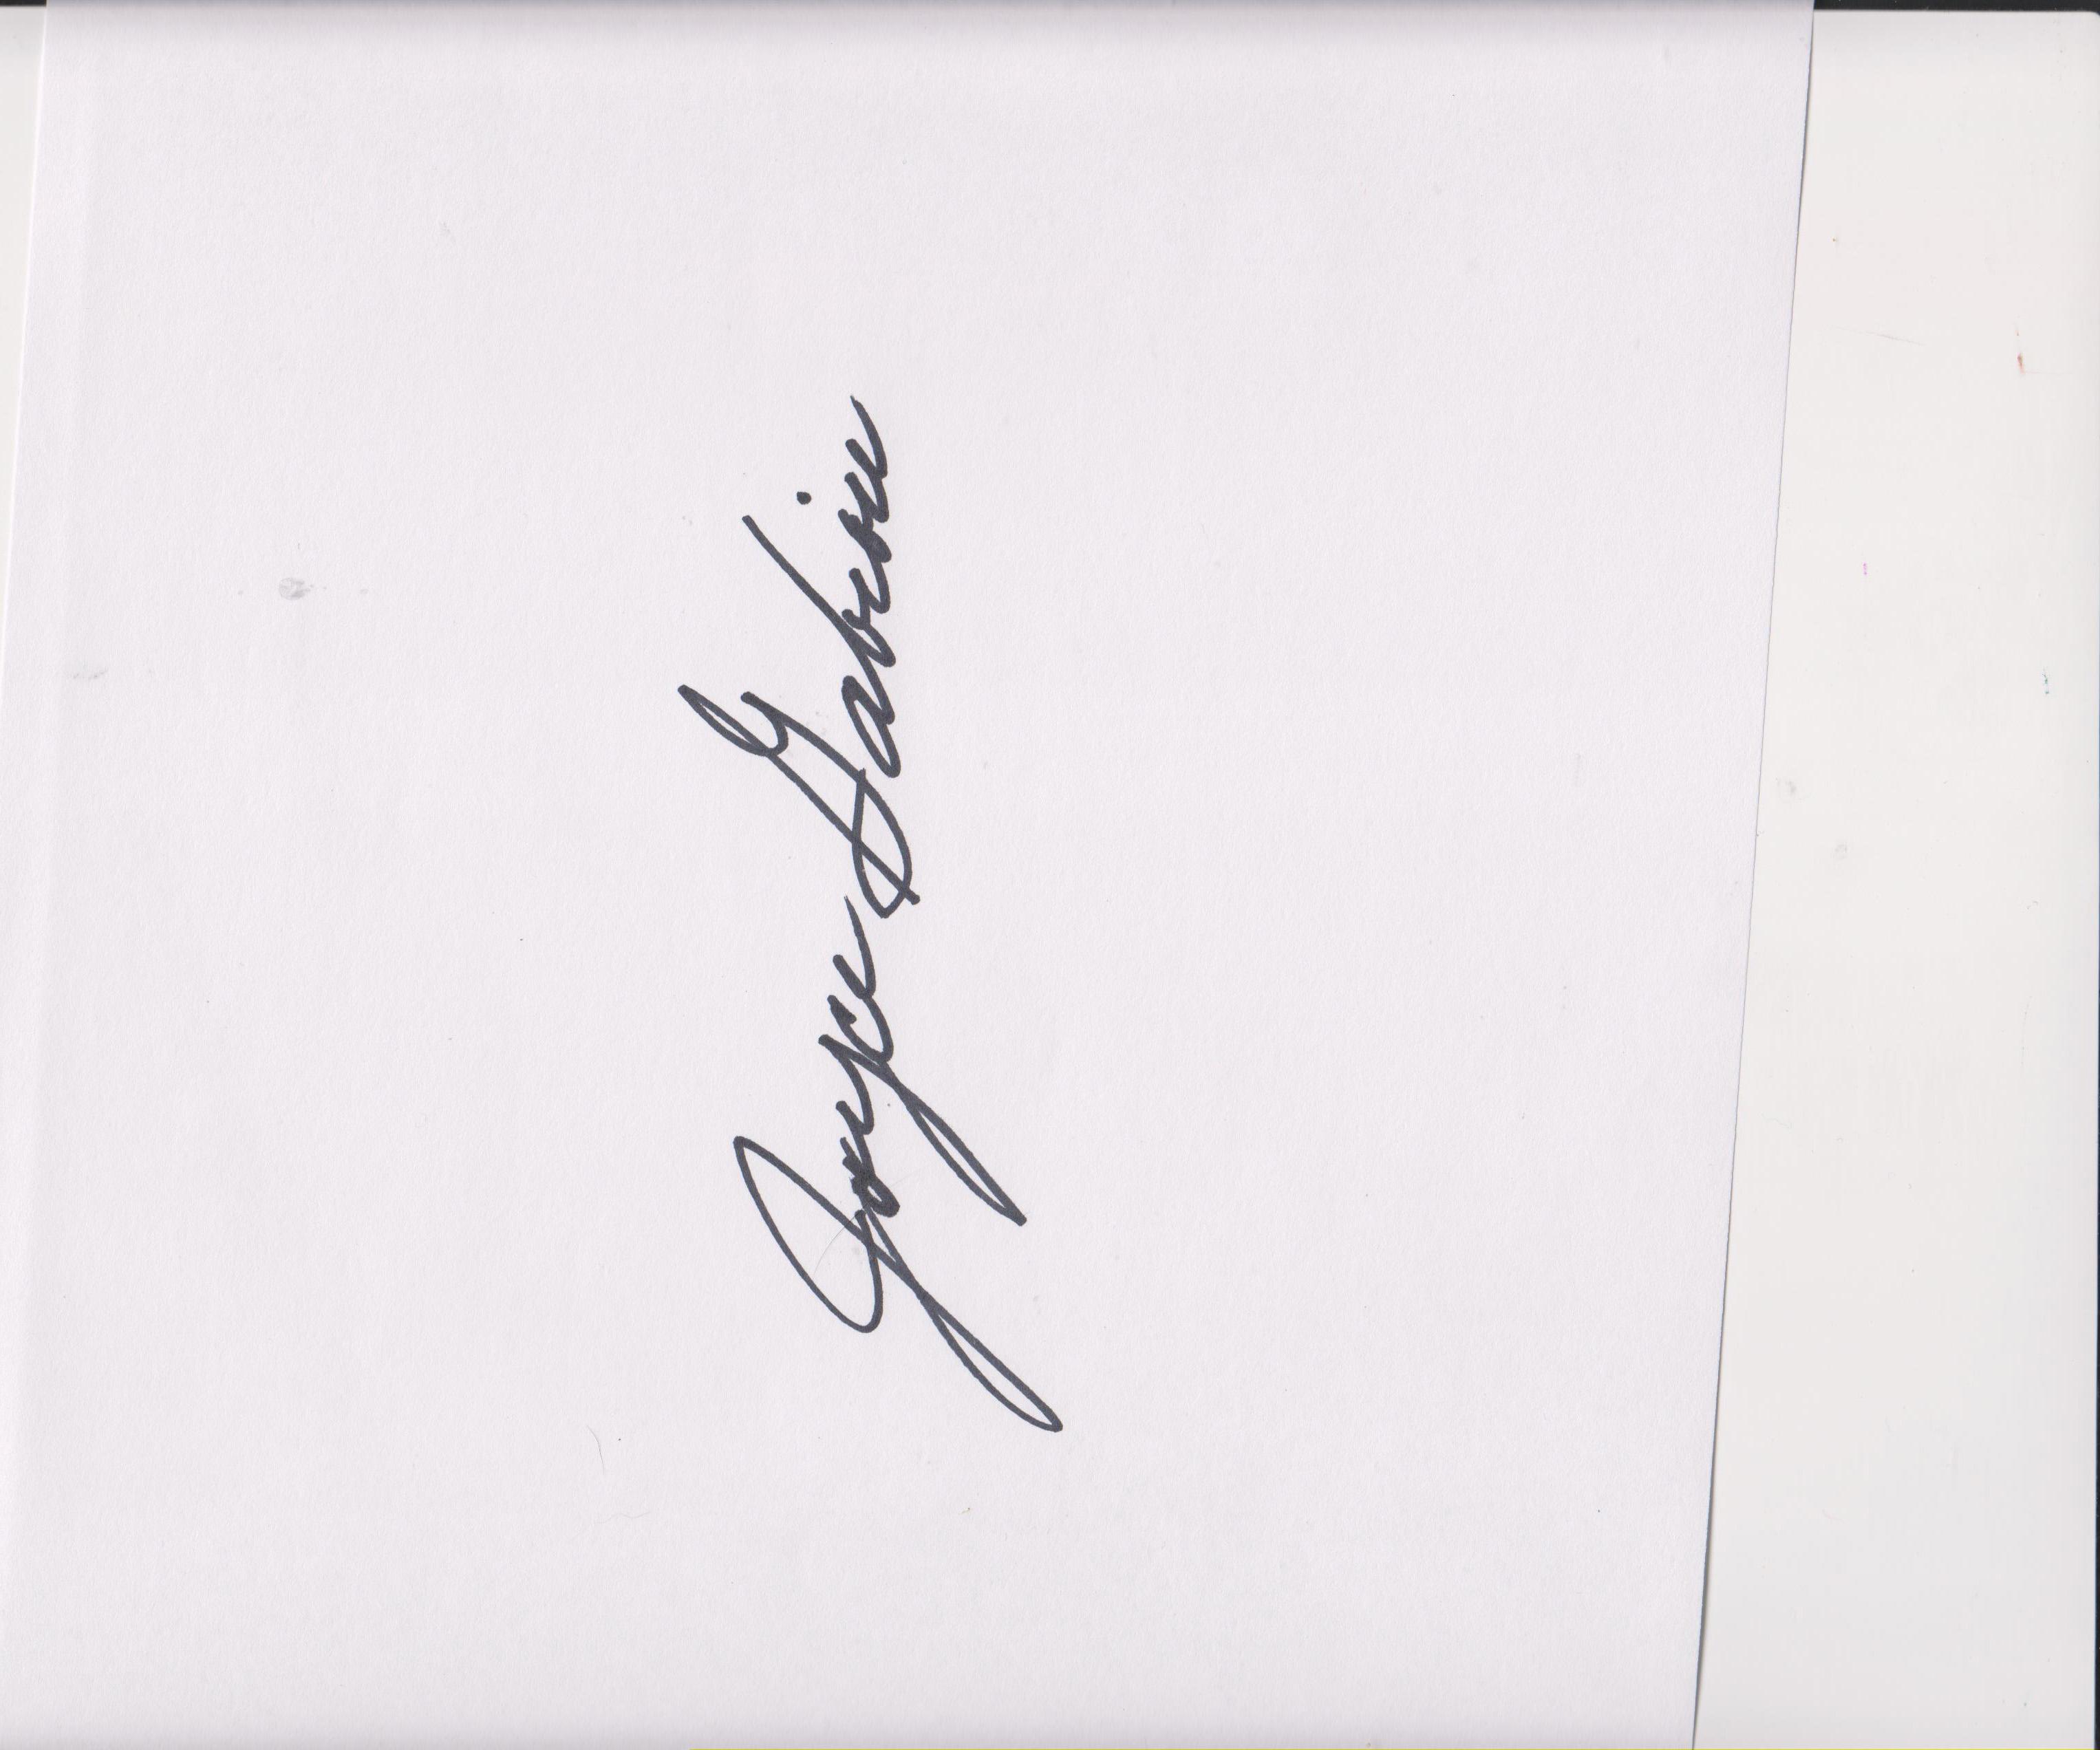 Joyce Gabiou's Signature